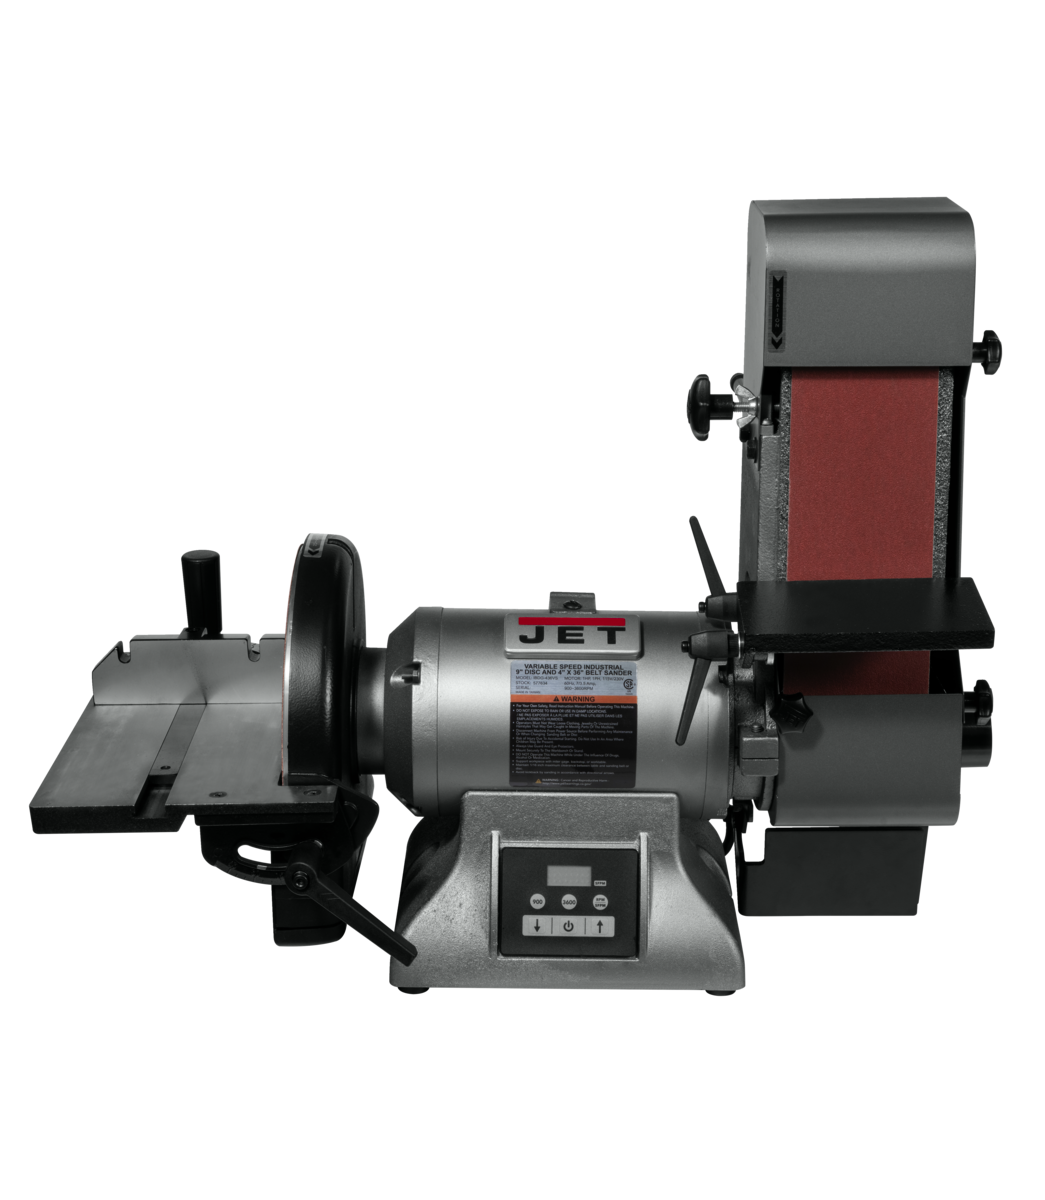 "IBDG-436VS Variable Speed Industrial 4"" x 36"" Belt and 9"" Disc Grinder"